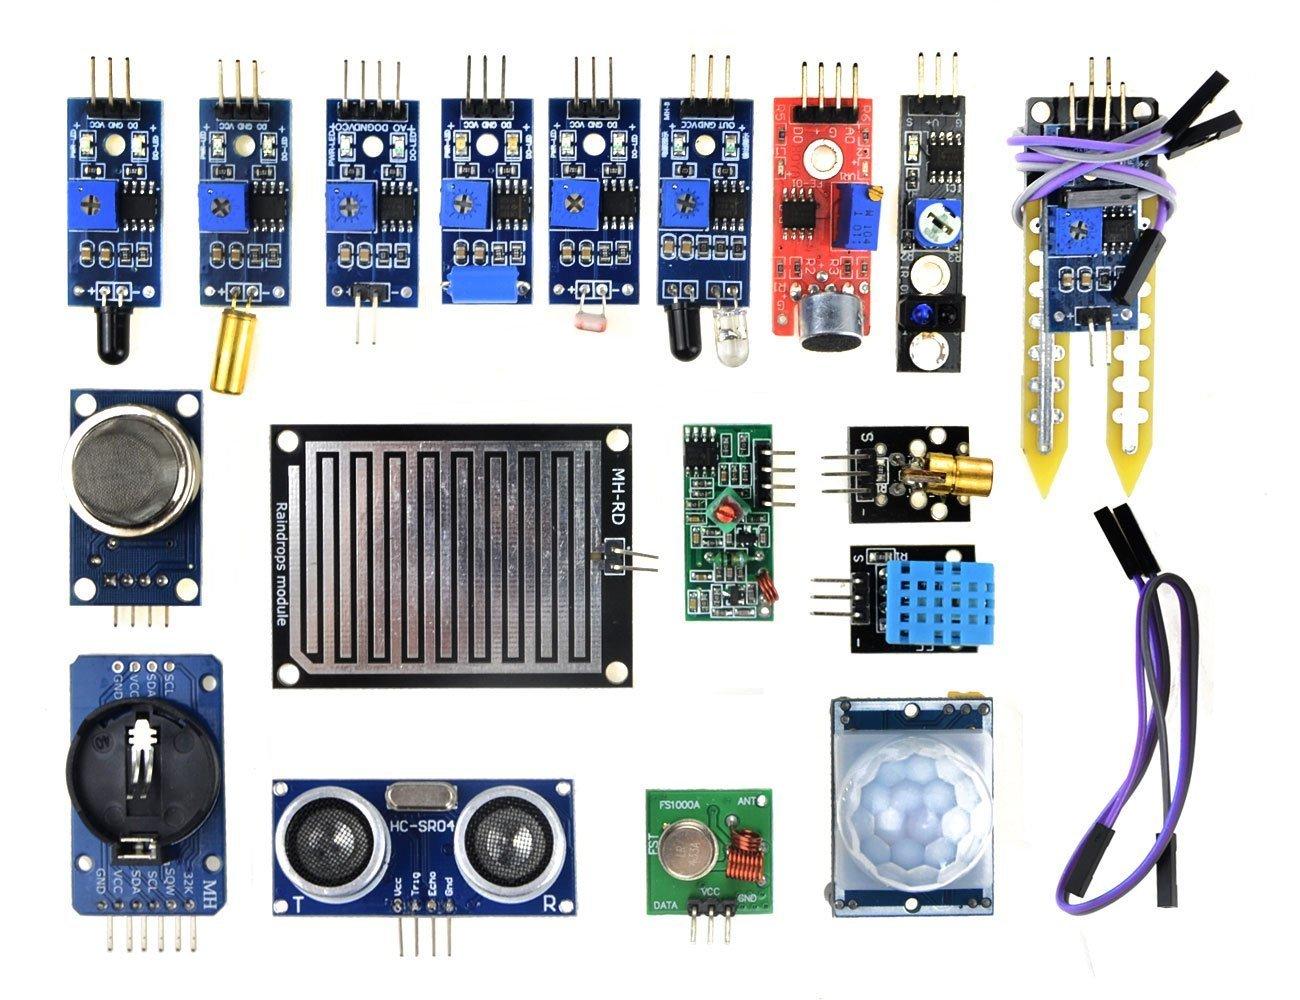 Wingoneer 16pcs Lot Sensor Module Board Kit For Arduino Mini Project On Pyroelectric Fire Alarm Electronics Raspberry Pi 3 2 Model B Industrial Scientific